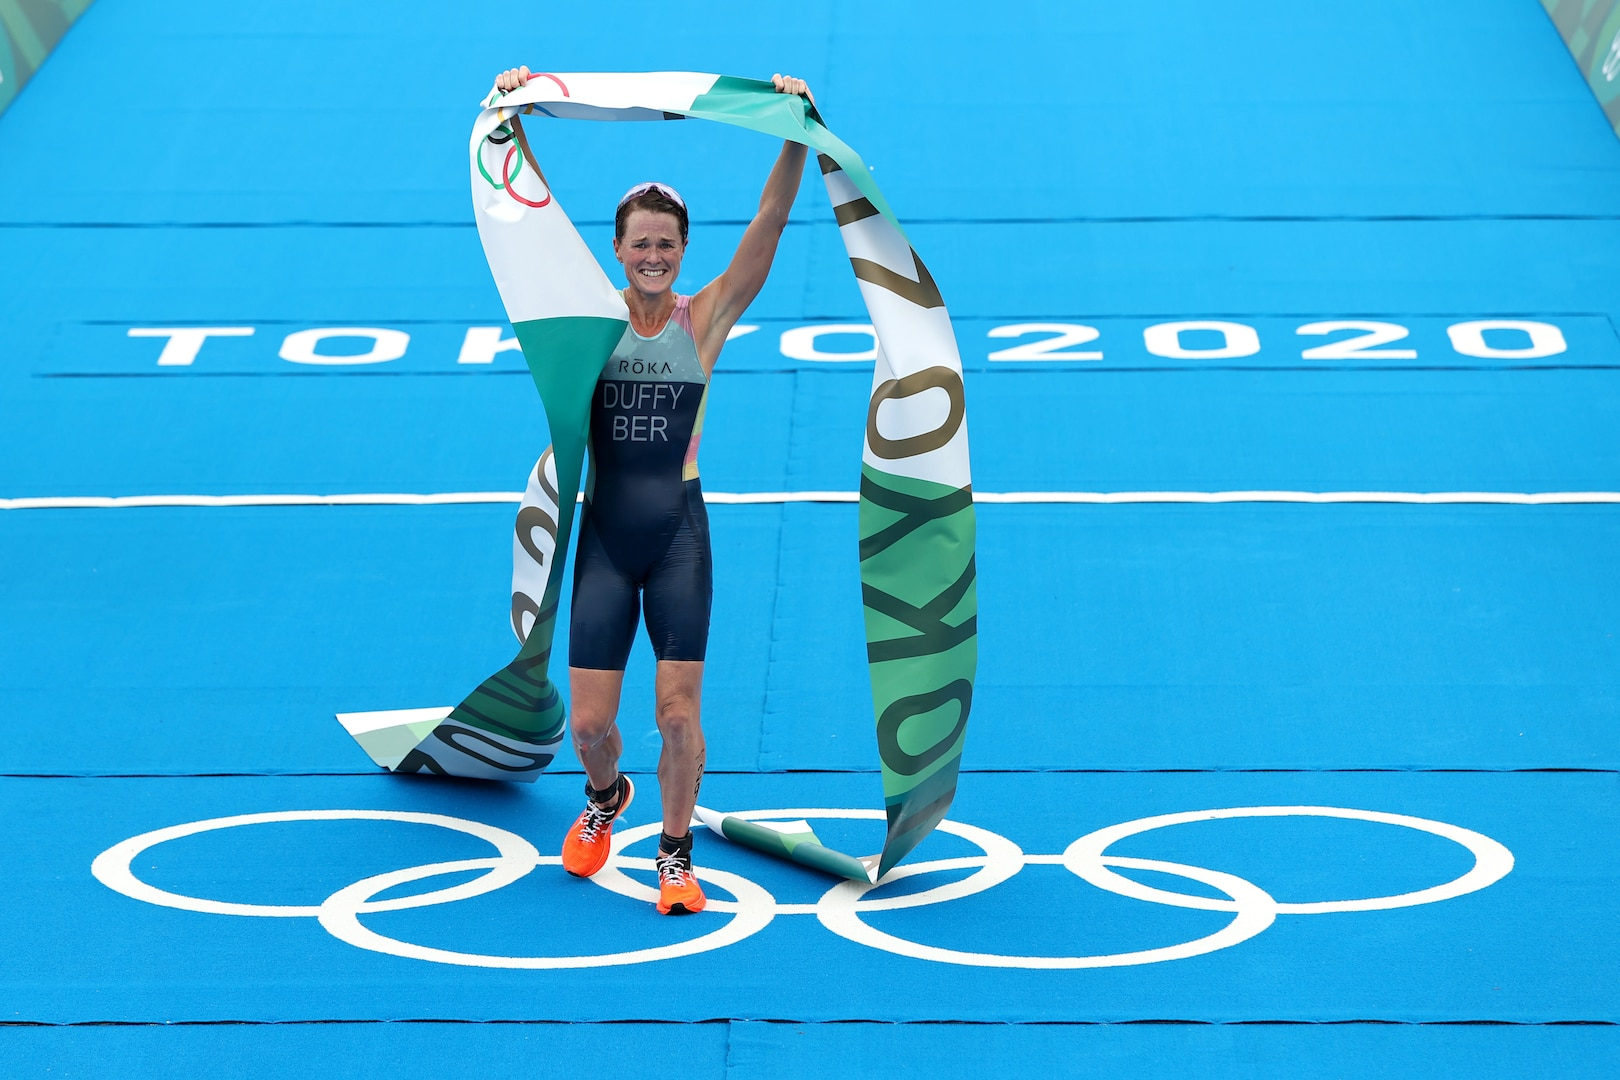 Flora Duffy of Team Bermuda celebrates winning the gold medal during the Women's Individual Triathlon